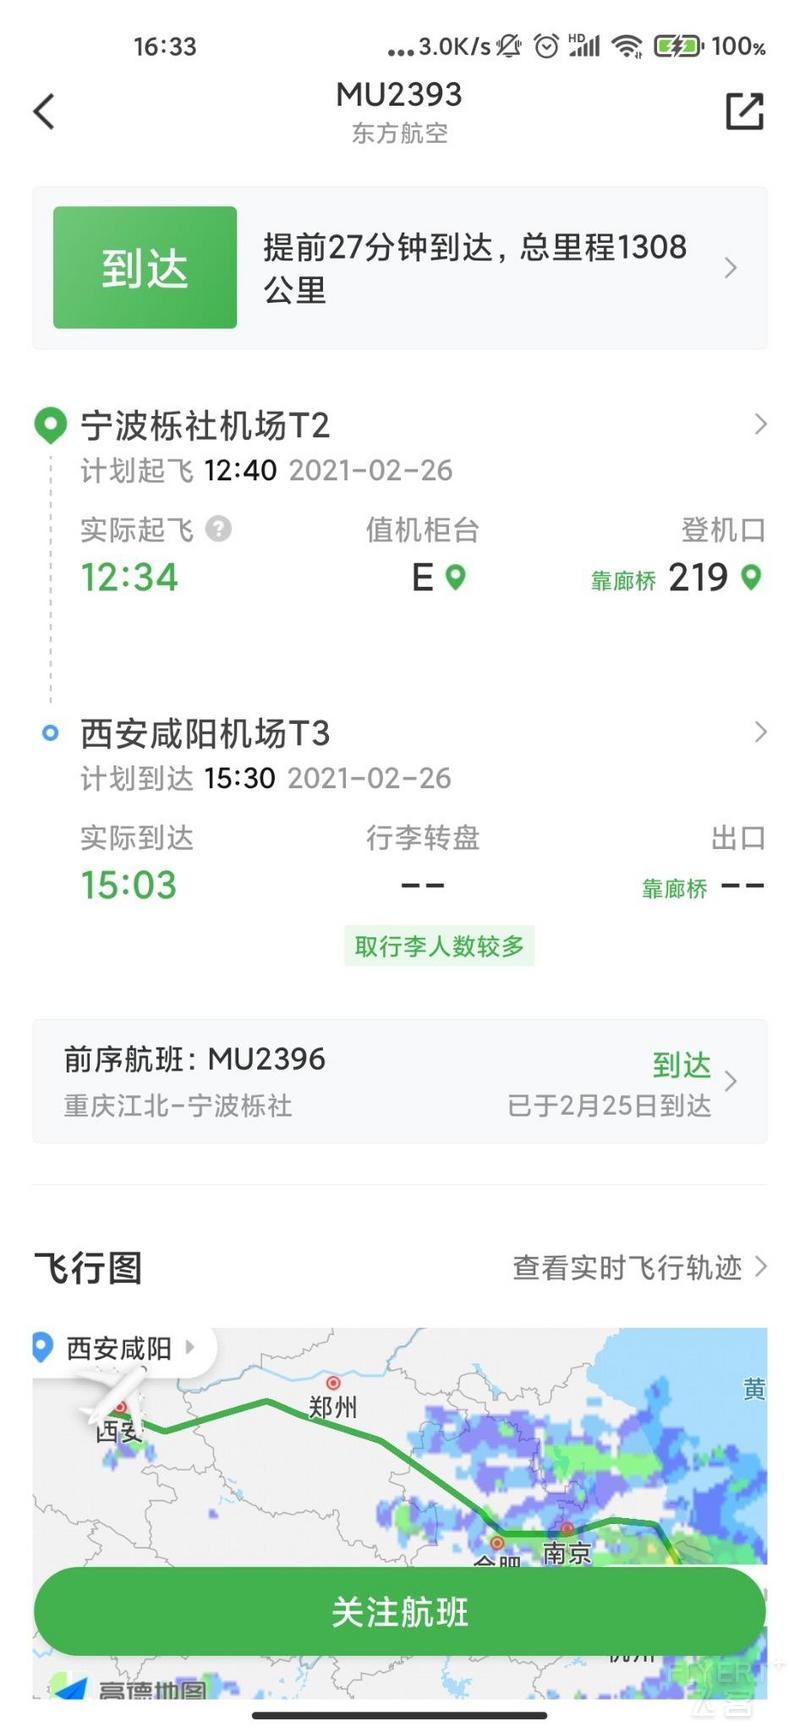 Screenshot_2021-02-26-16-33-17-069_com.umetrip.android.msky.app.jpg